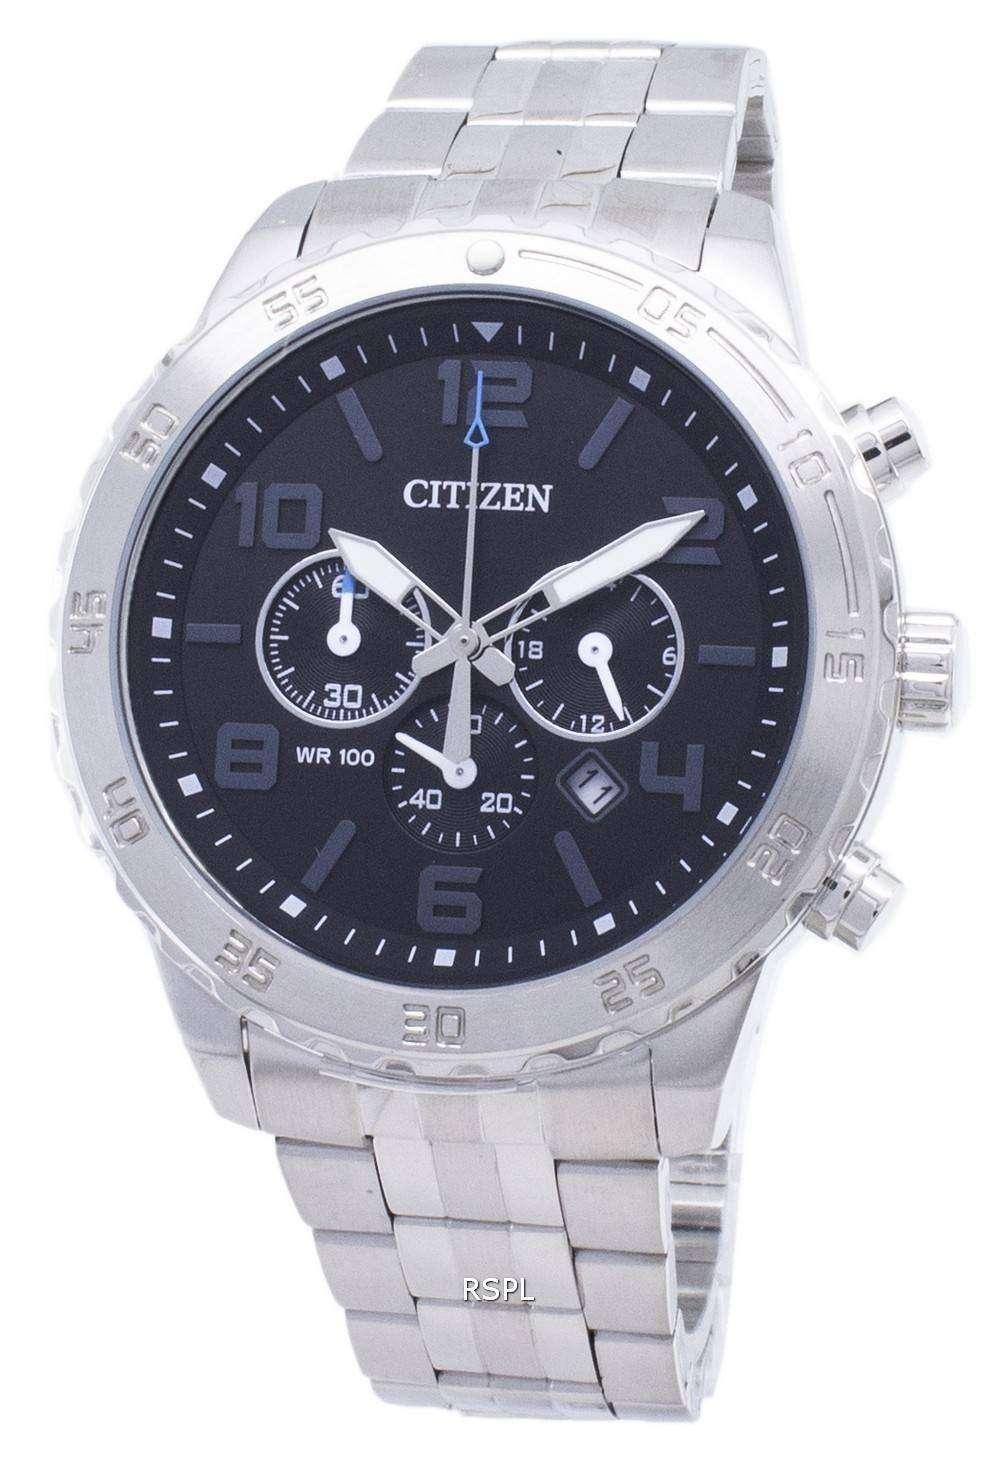 Citizen 시티즌 시계 쿼 츠 AN8130-53E 크로 노 그래프 아날로그 남성용 손목시계